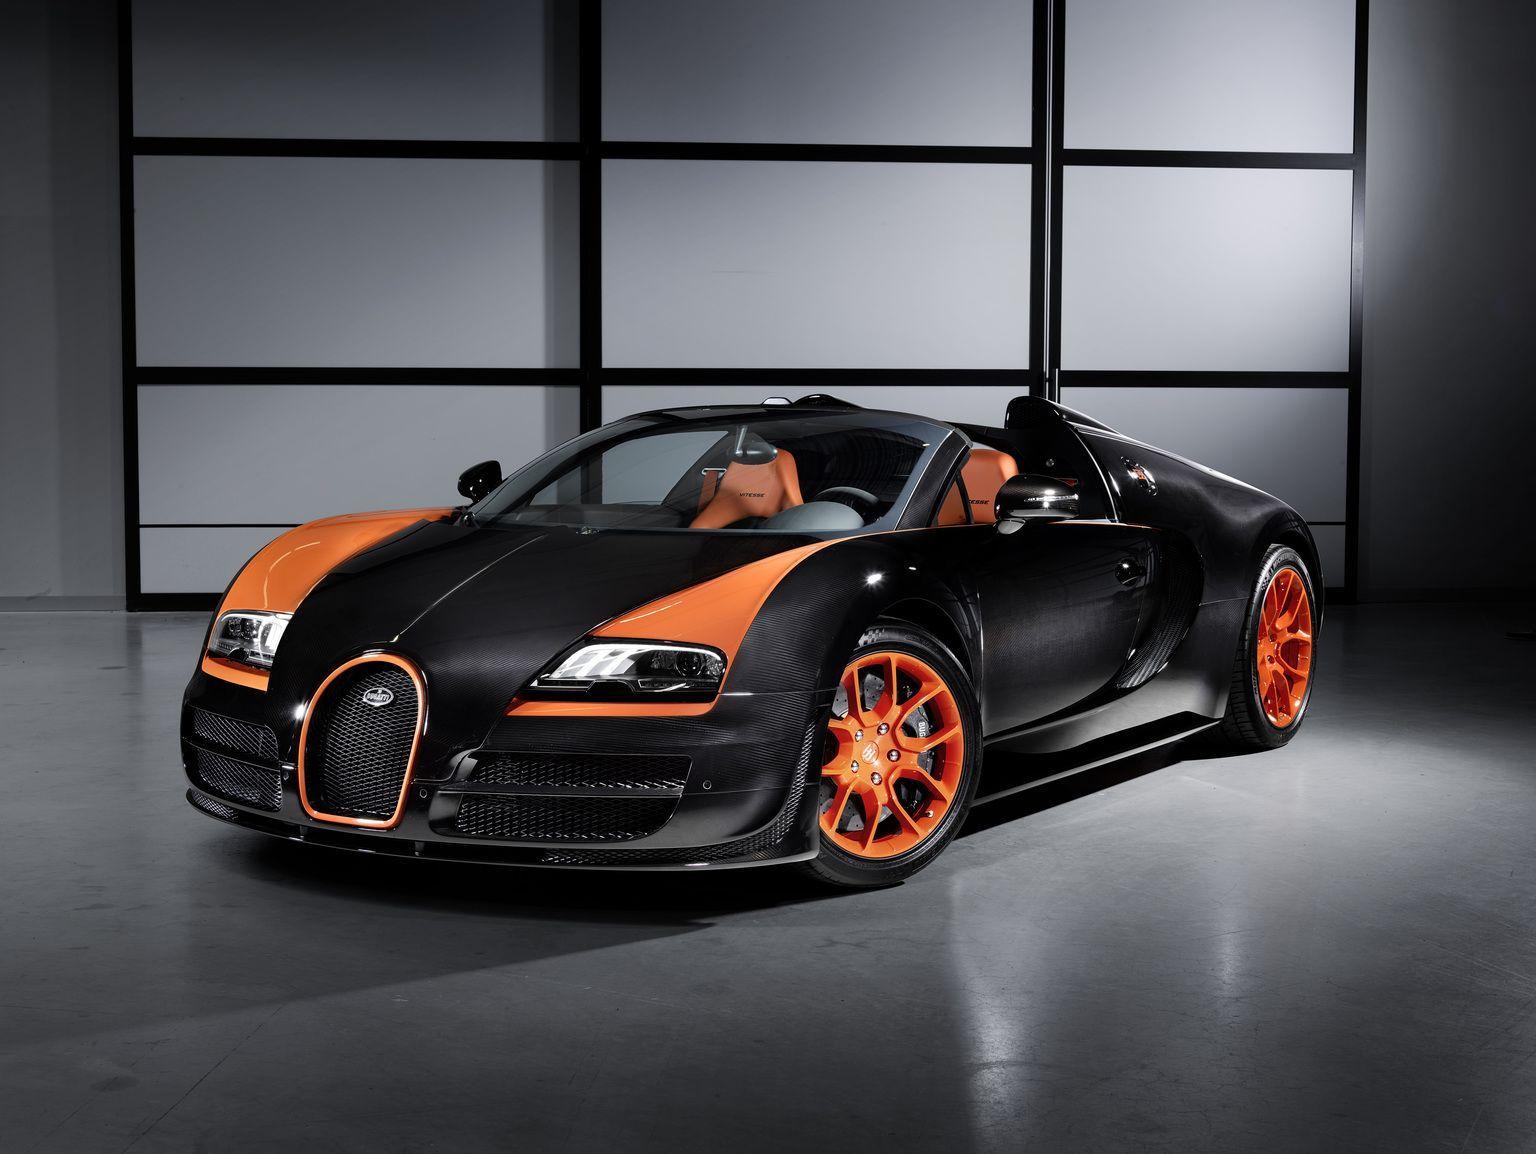 Bugatti 16 4 Veyron Grand Sport Vitesse Wrc Edition Bugatti